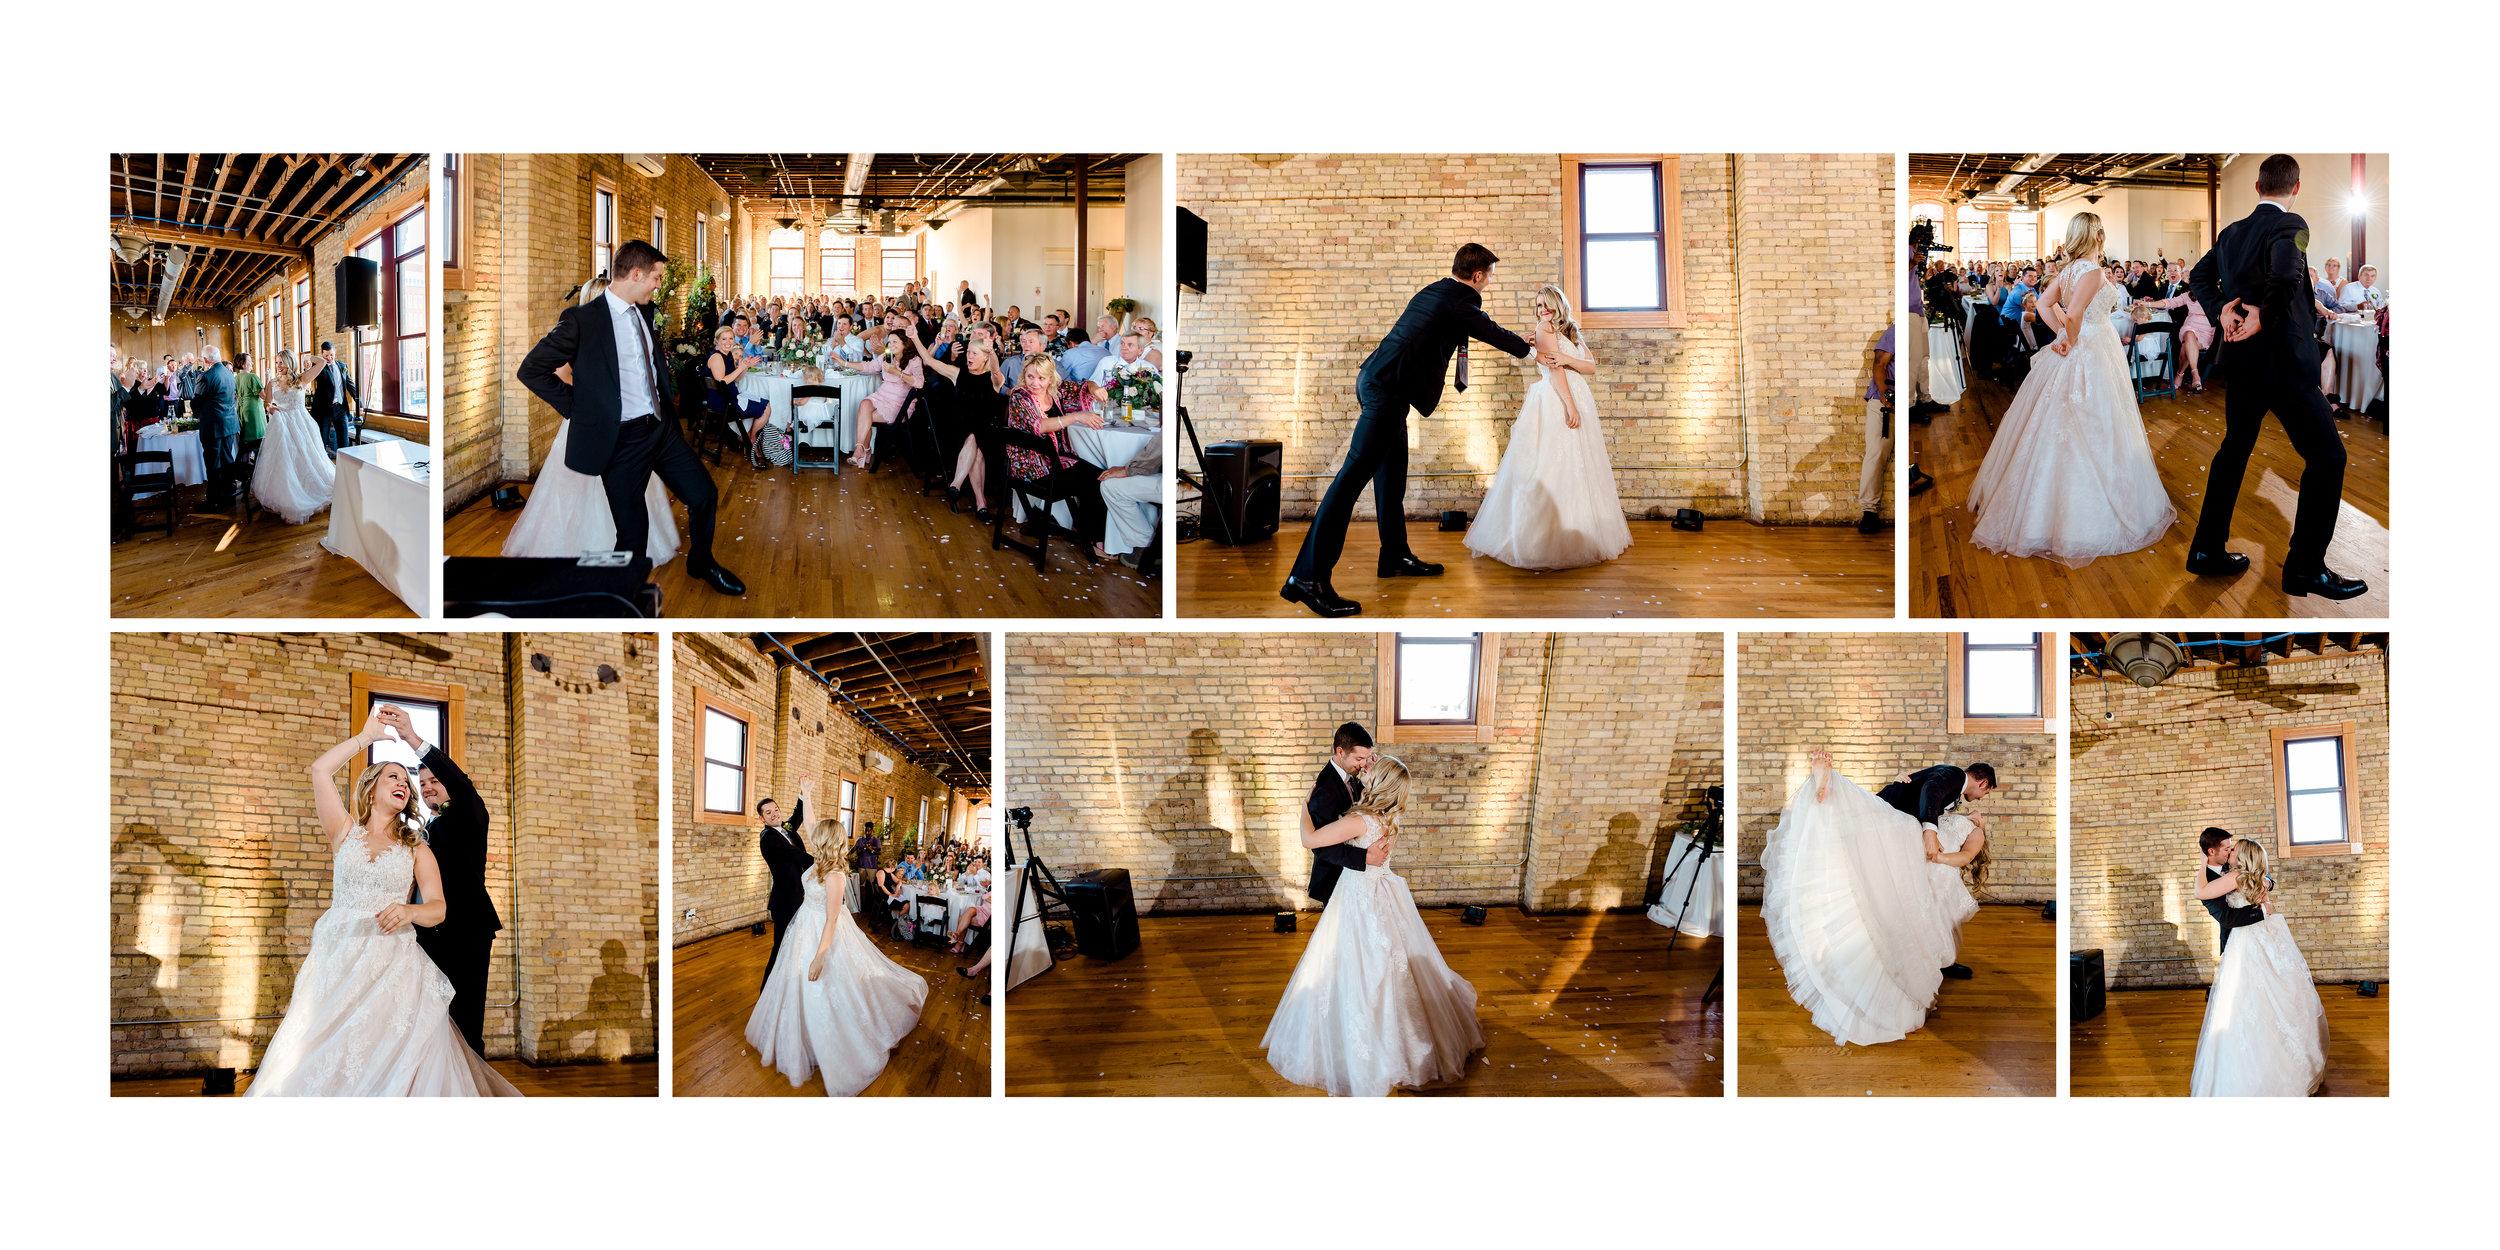 Kristen + Eric - Wedding Album Sample_26.jpg